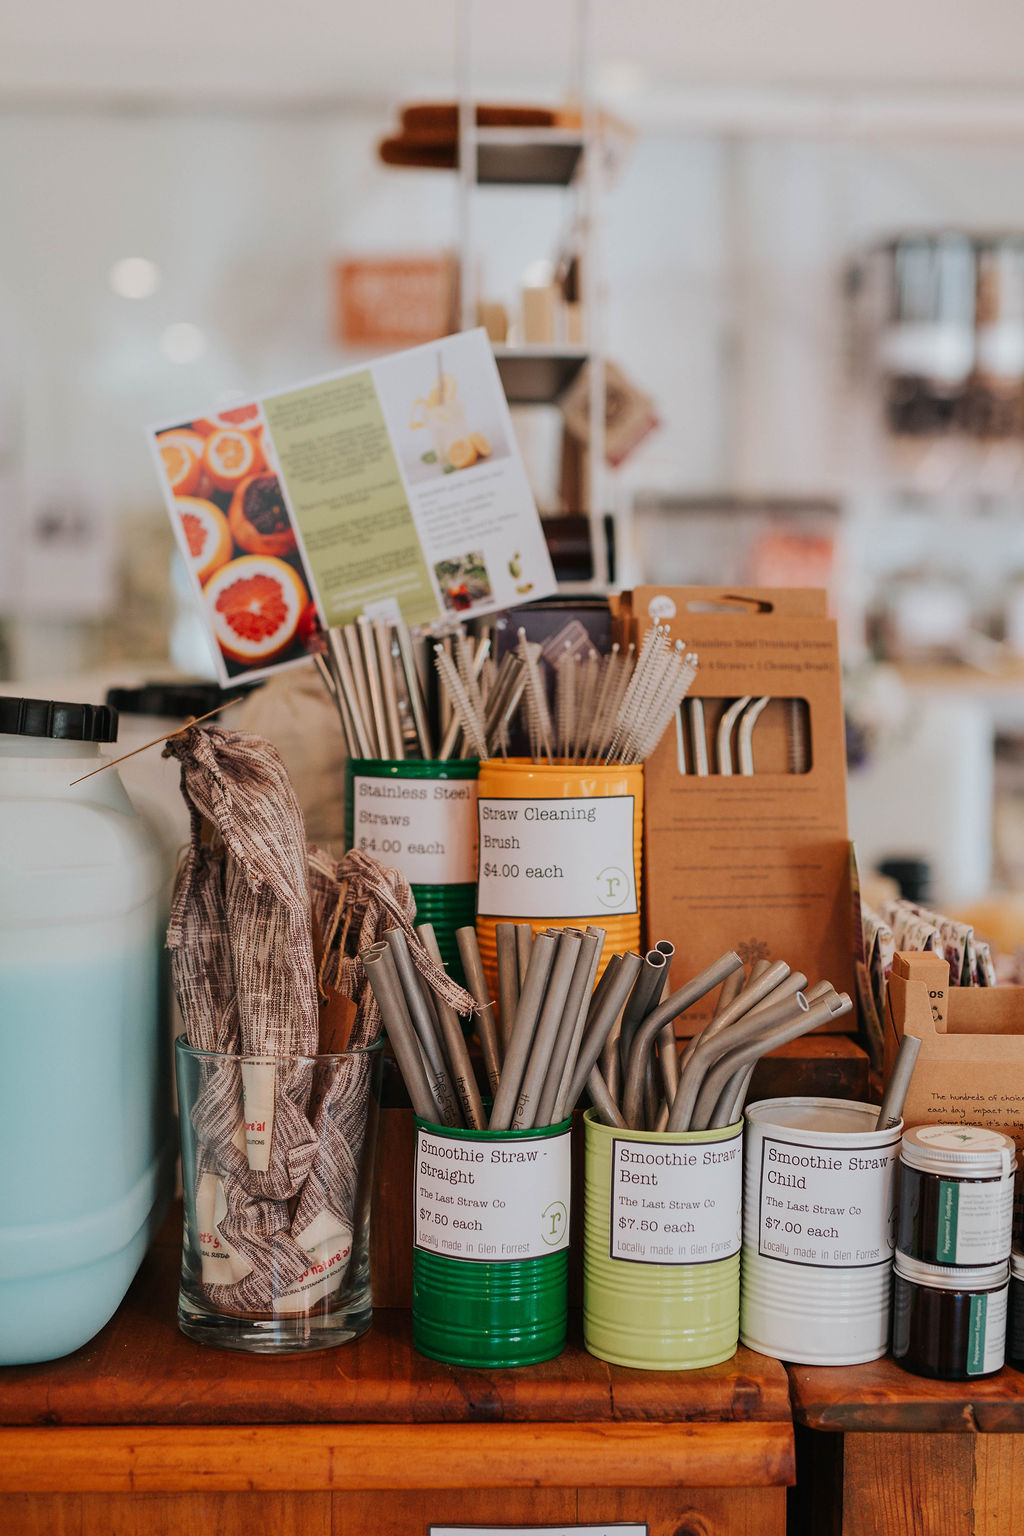 Replenish_Unpackaged_Living_Perth_Kalamunda_Waste_Free_Shopping_Bulk_Groceries_Sustainable_Zero_Wast_Wasteless_Goods_Whole_Foods_Plastic_Free_HOME_Gallery_14.jpg